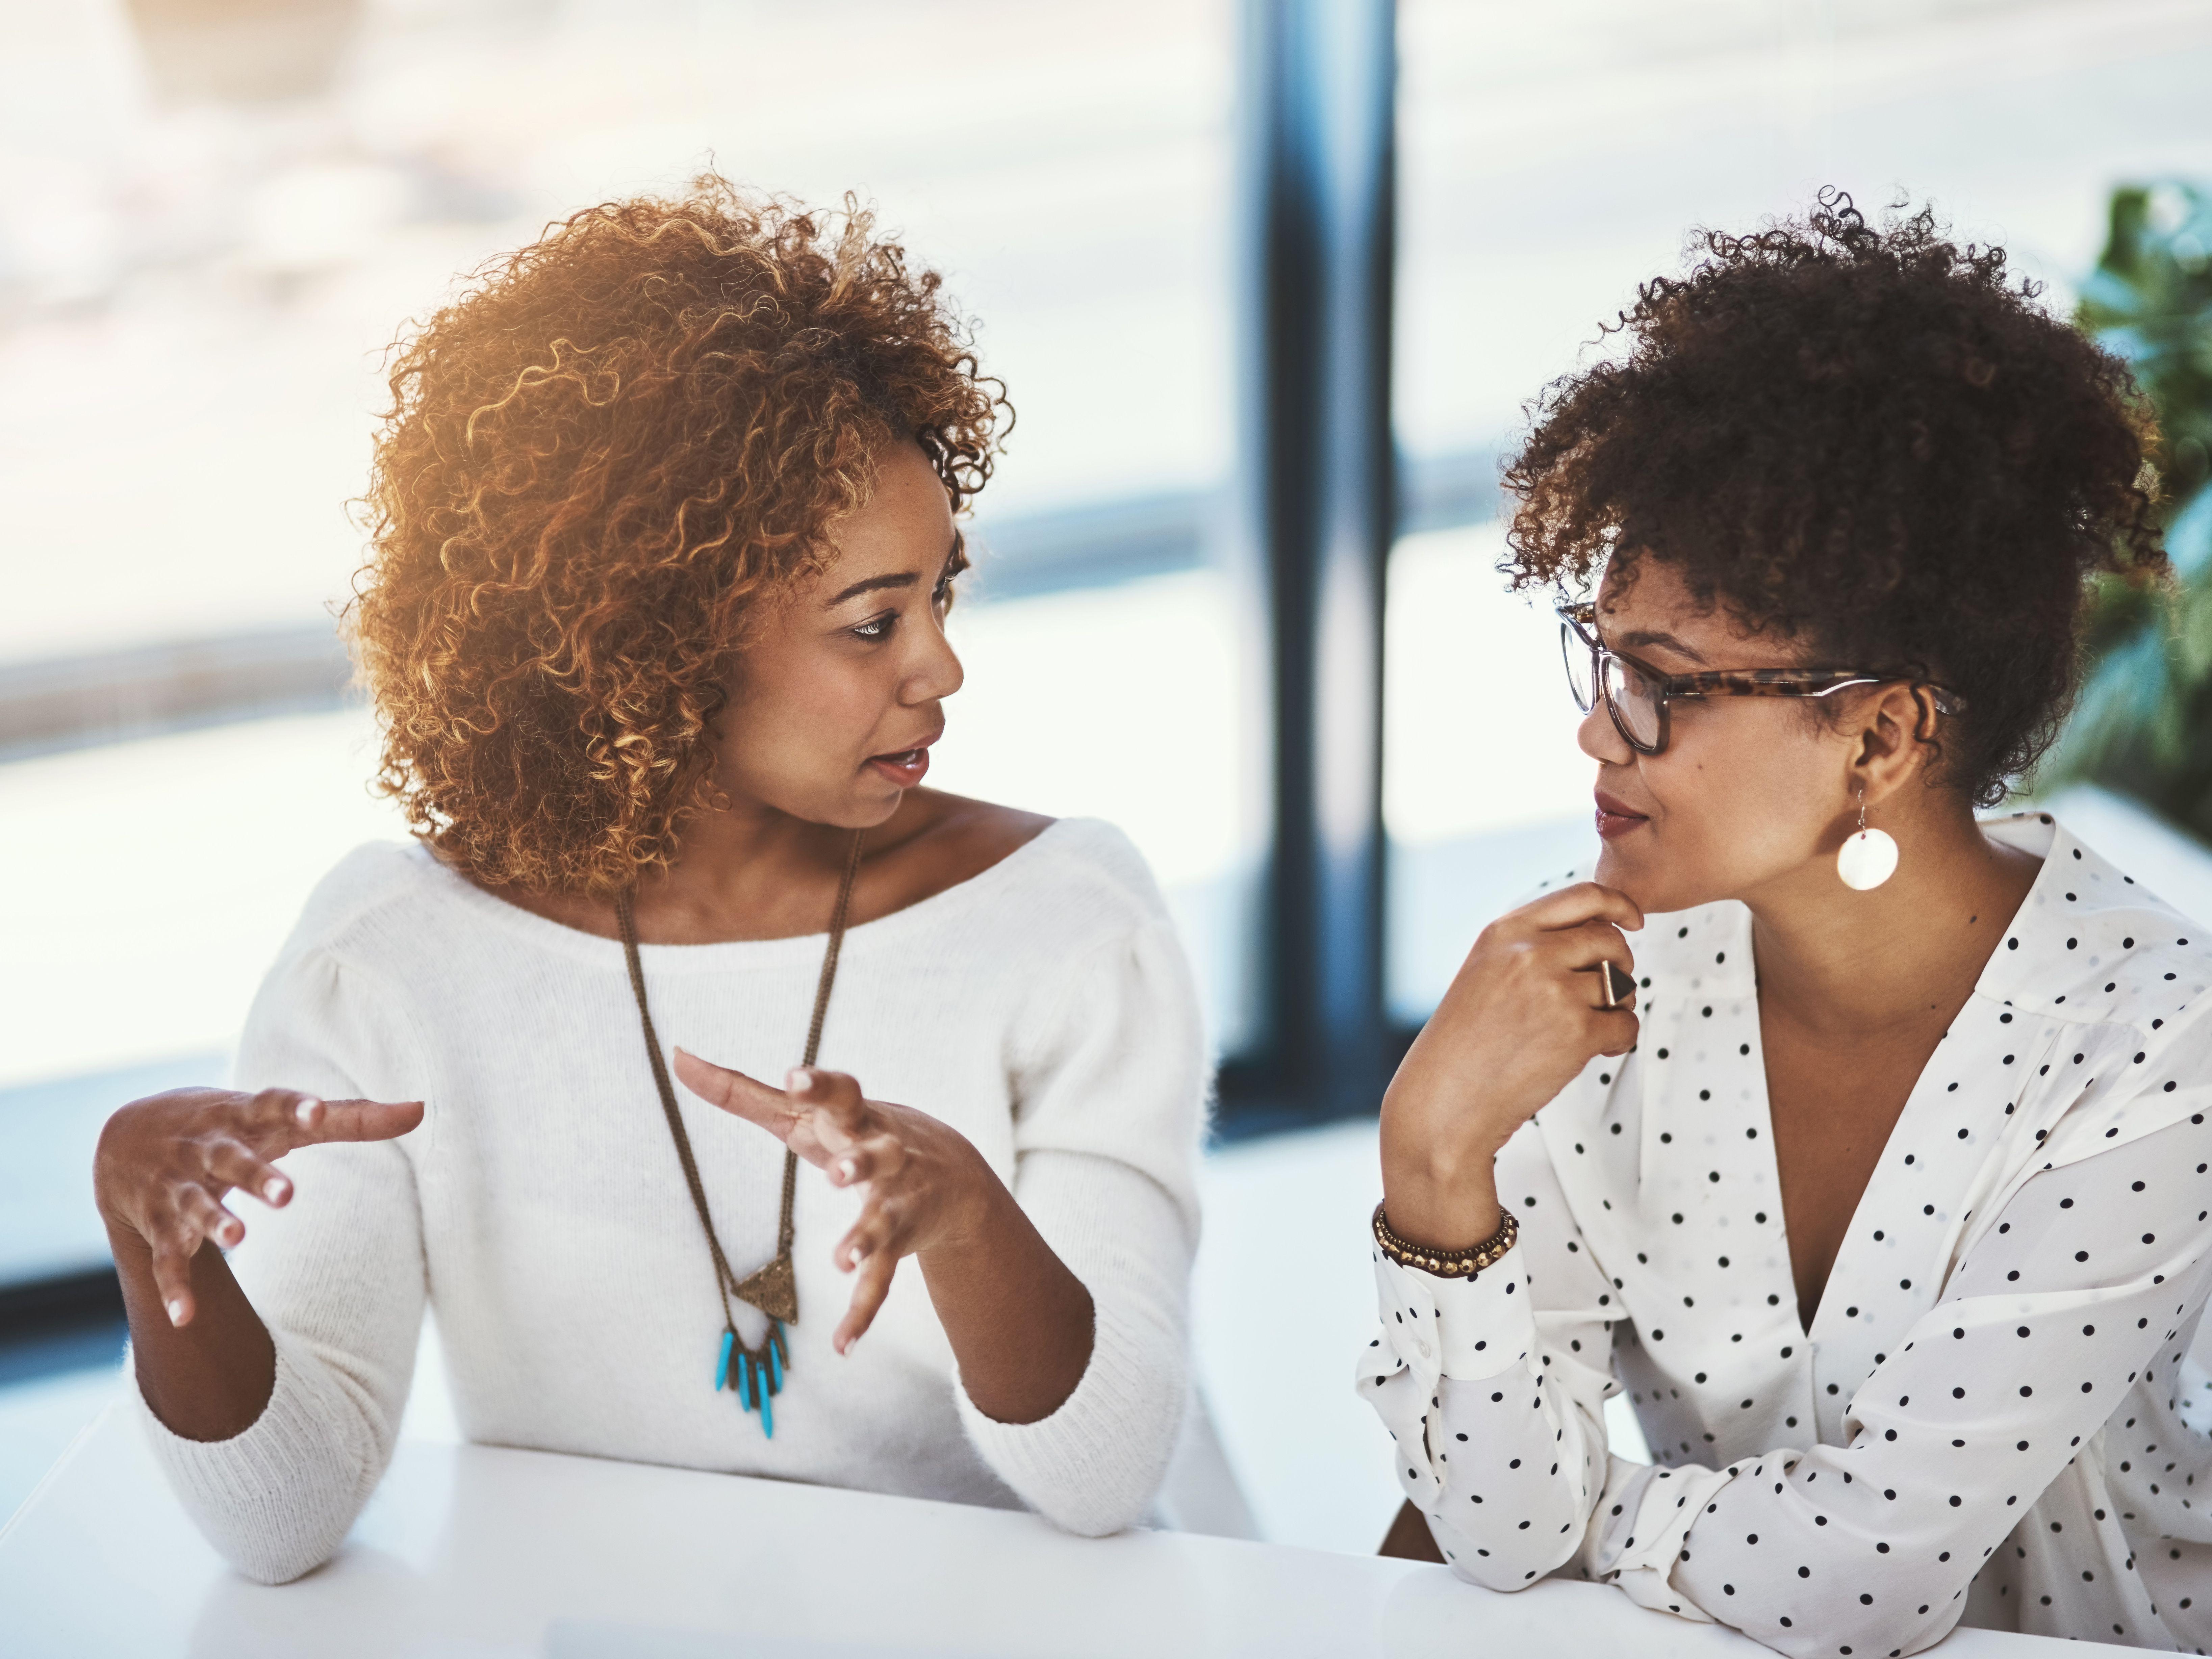 Turn-Taking Definition in Conversation Analysis